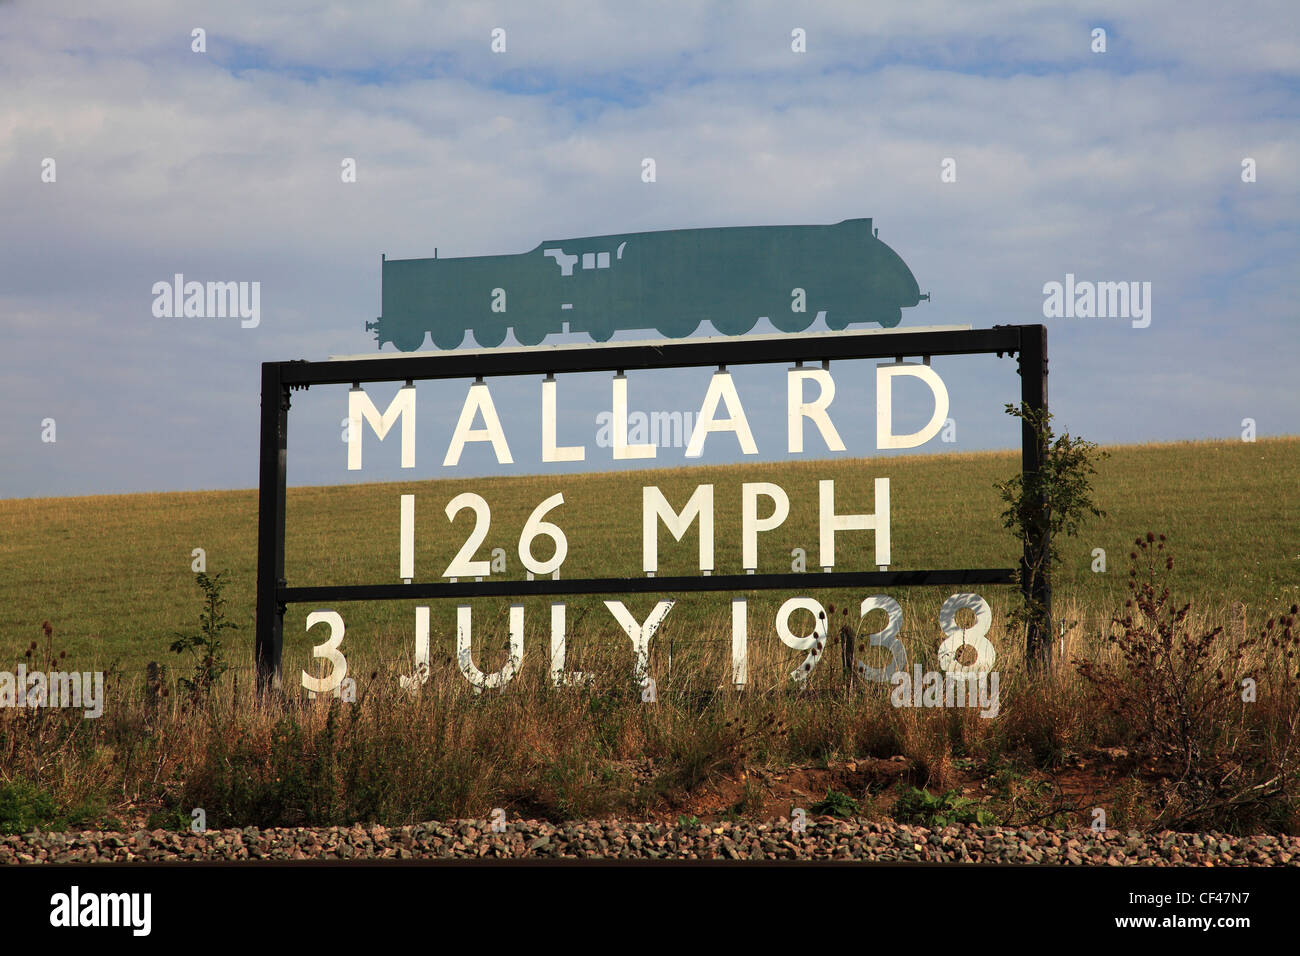 The Mallard Train Speed Record sign, East Coast Main Line Railway, Lincolnshire, England, UK - Stock Image